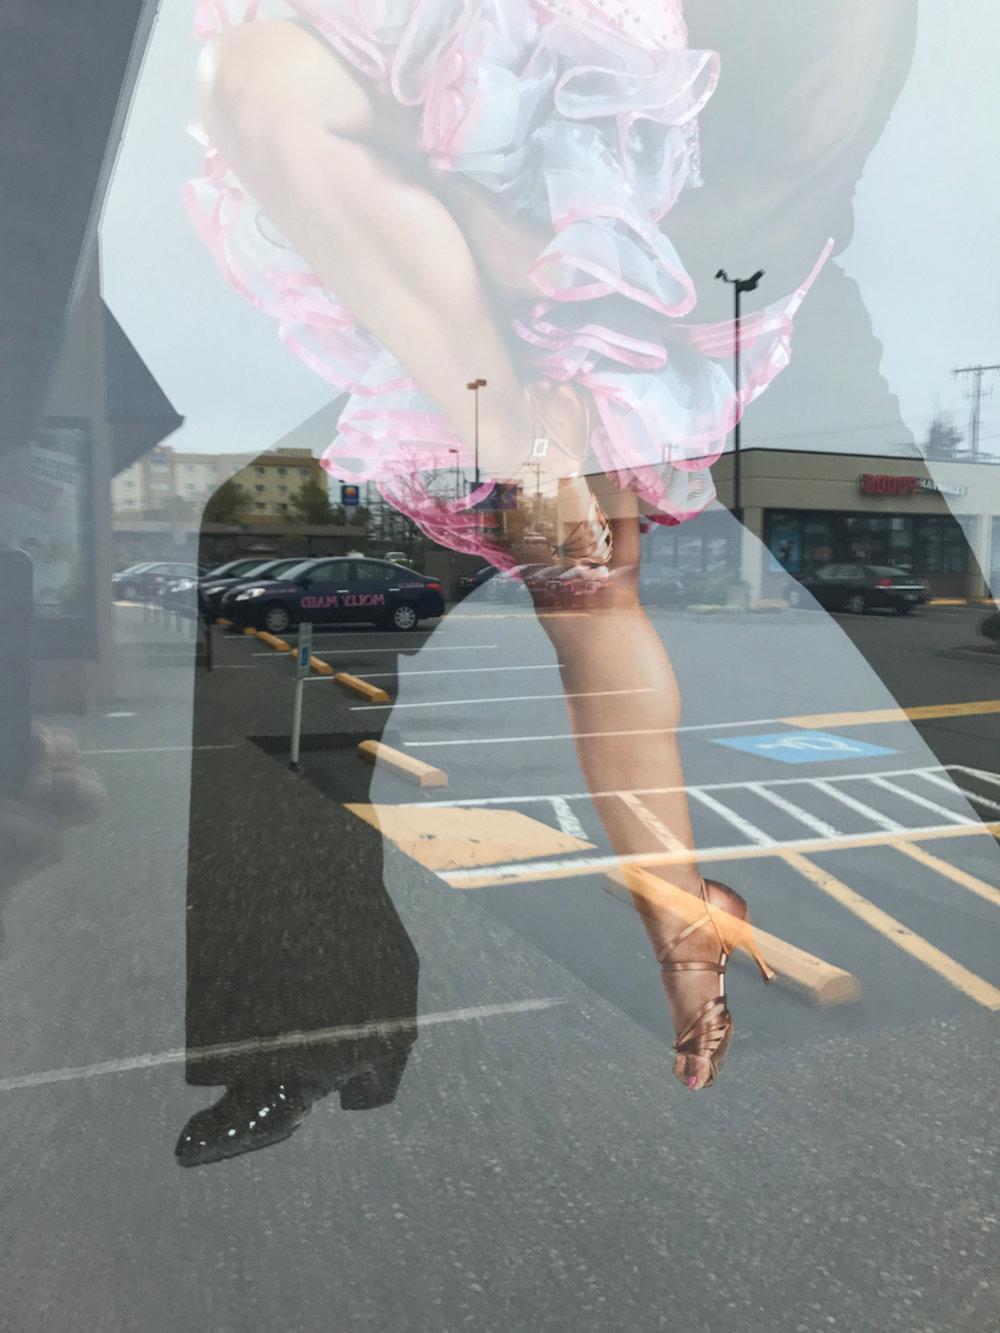 Ira_Waxberg_Dance_system_1.jpg